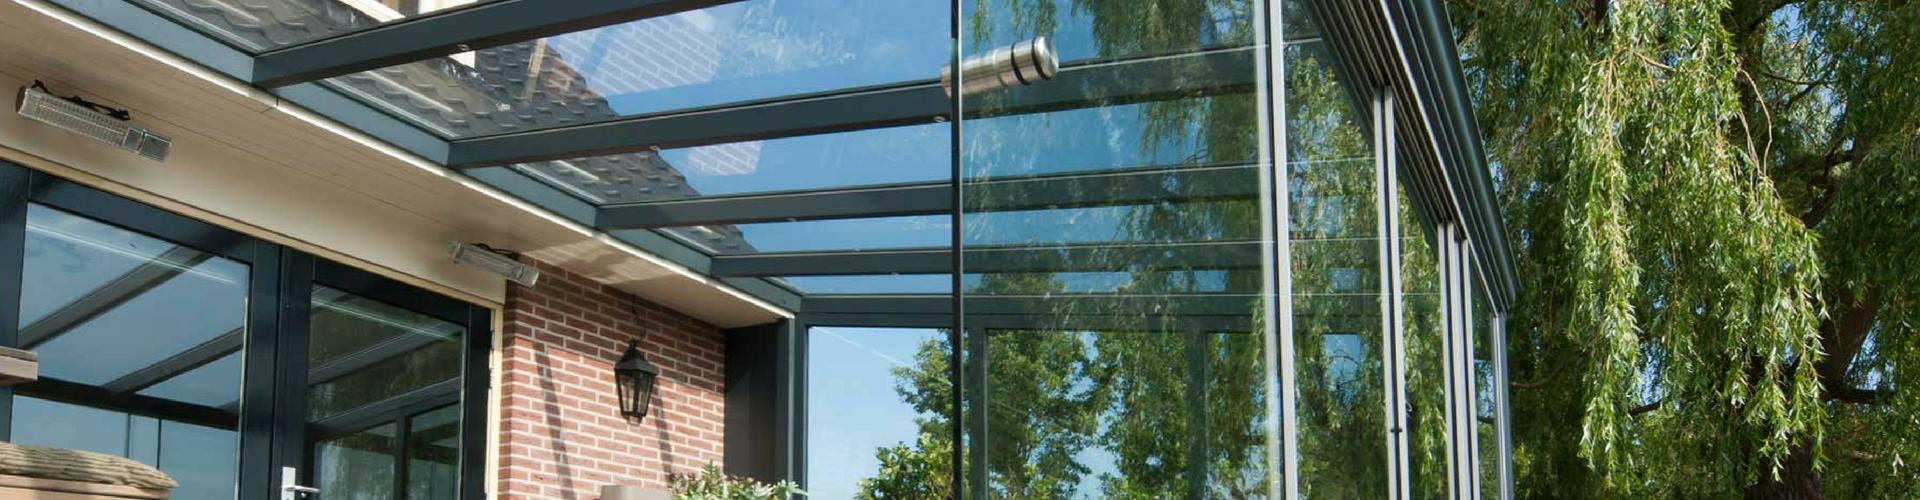 aluminium tuinkamer met  glazen dakbedekking